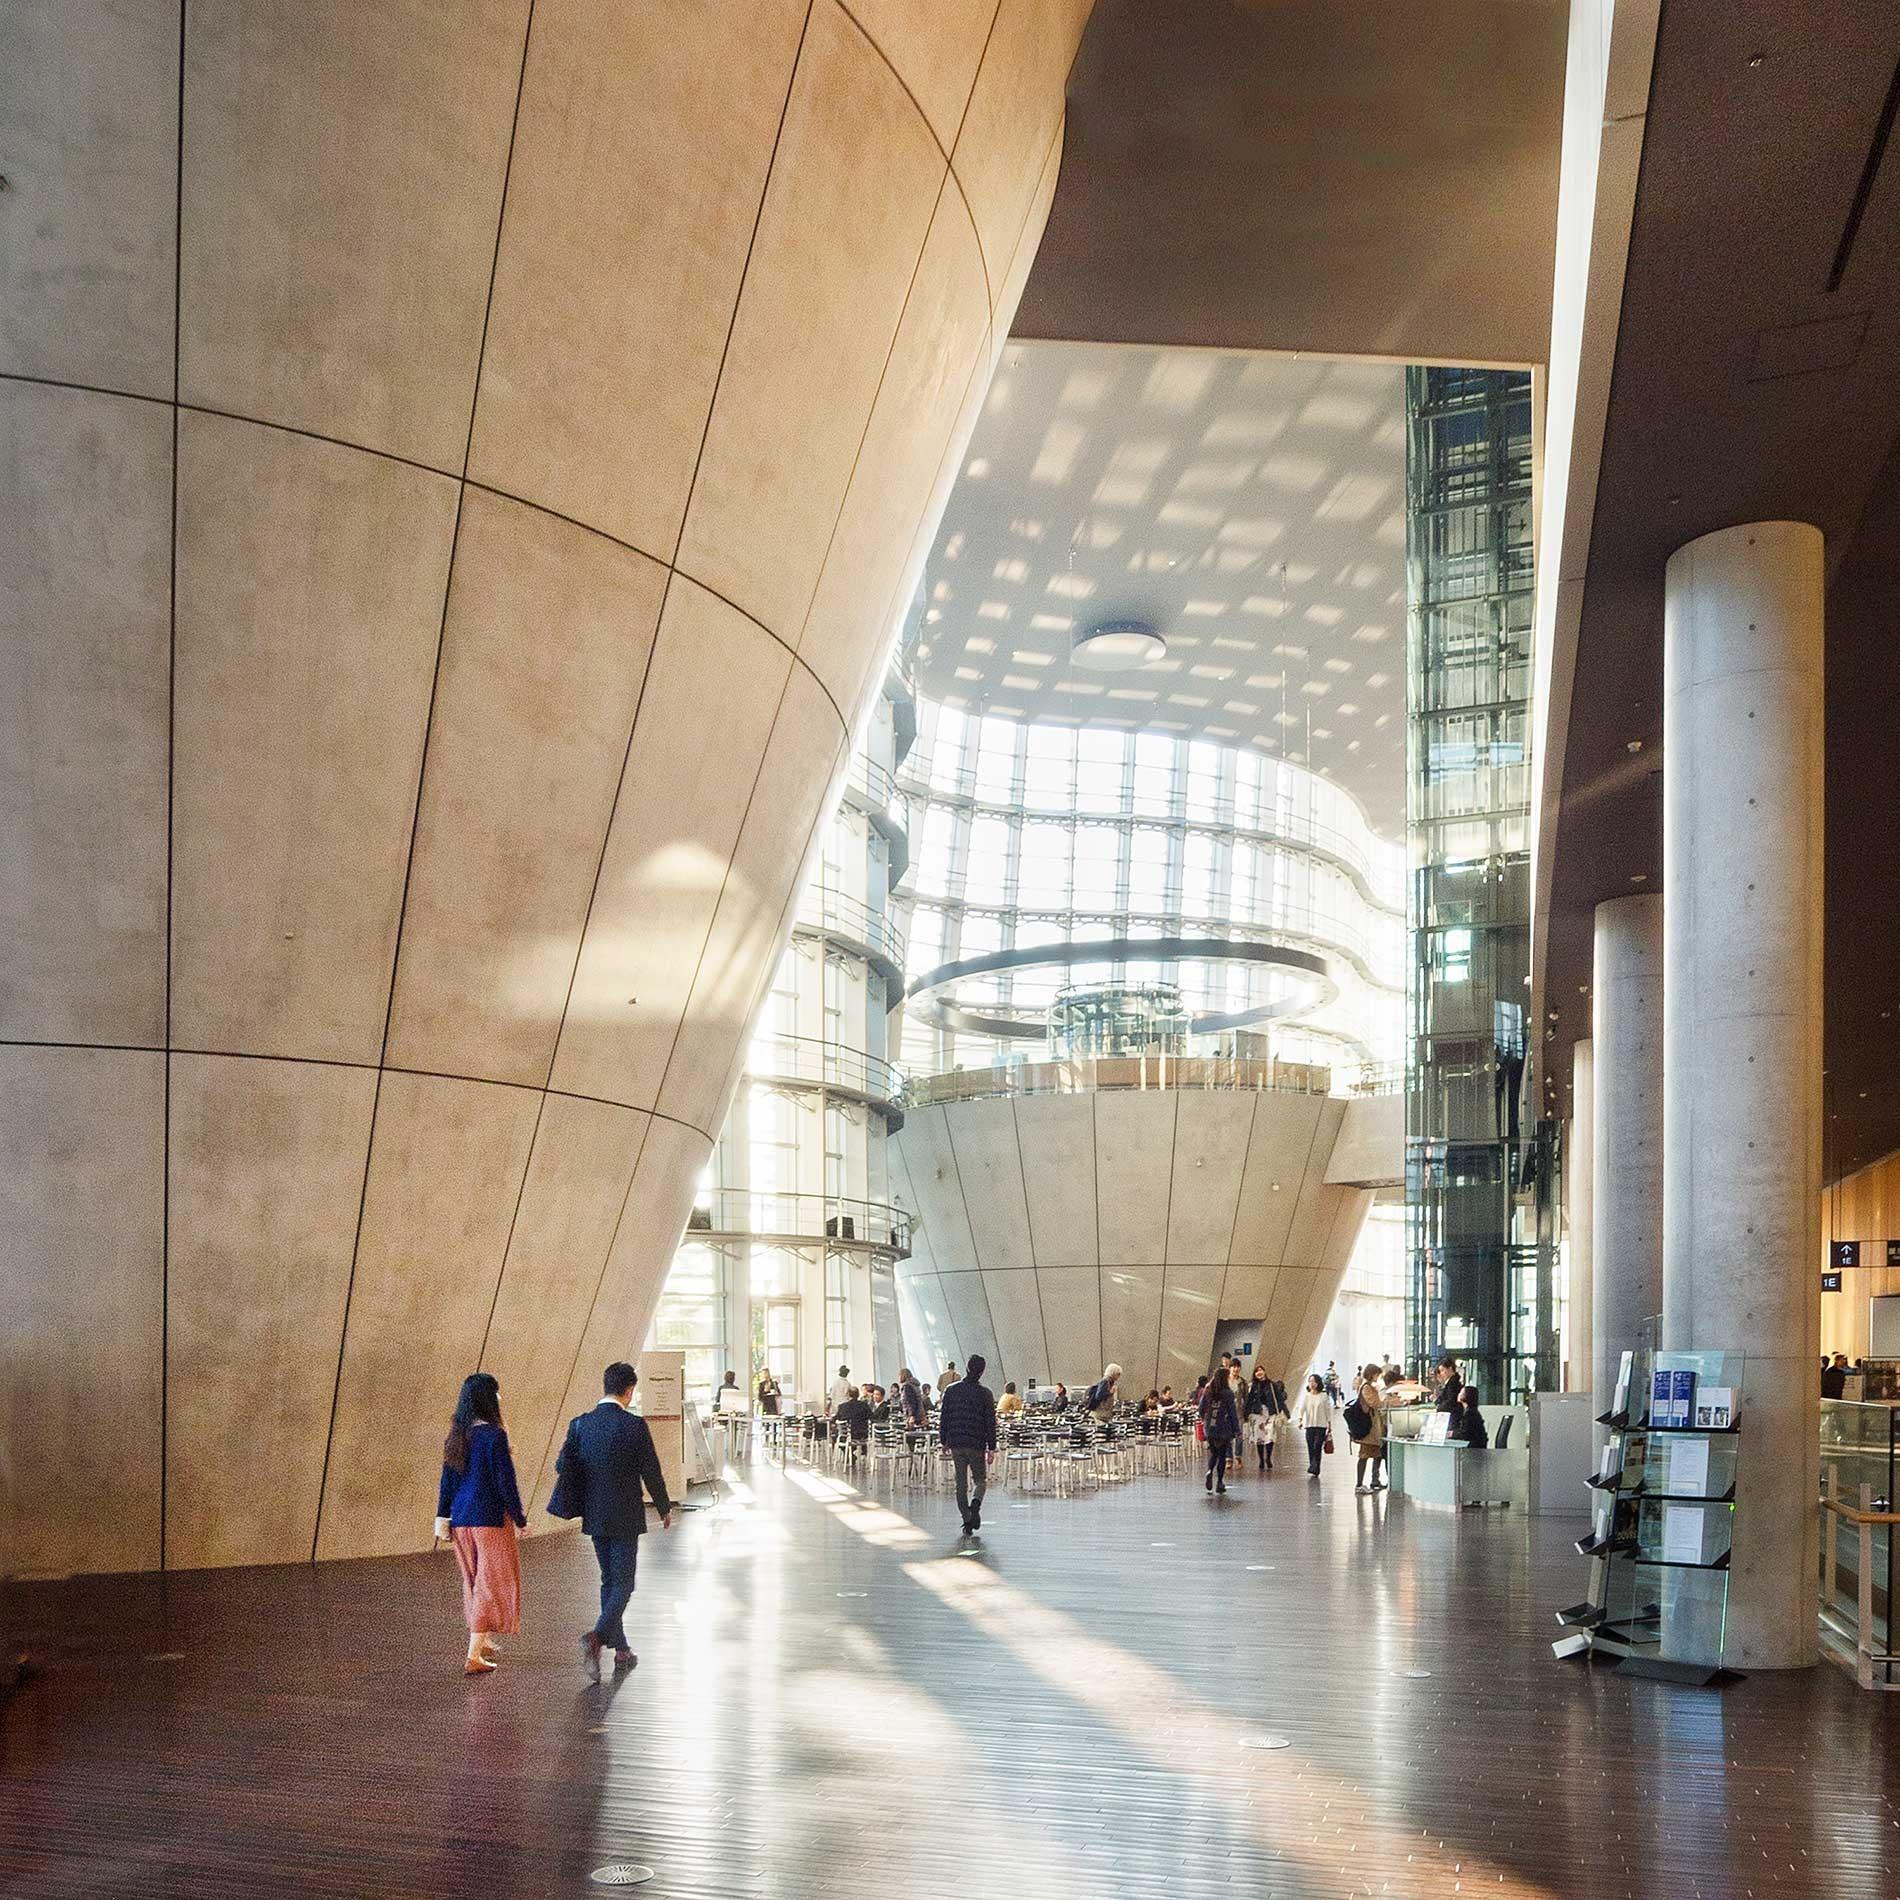 日本 Arch. Kishō Kurokawa, National Art Center, Tokyo